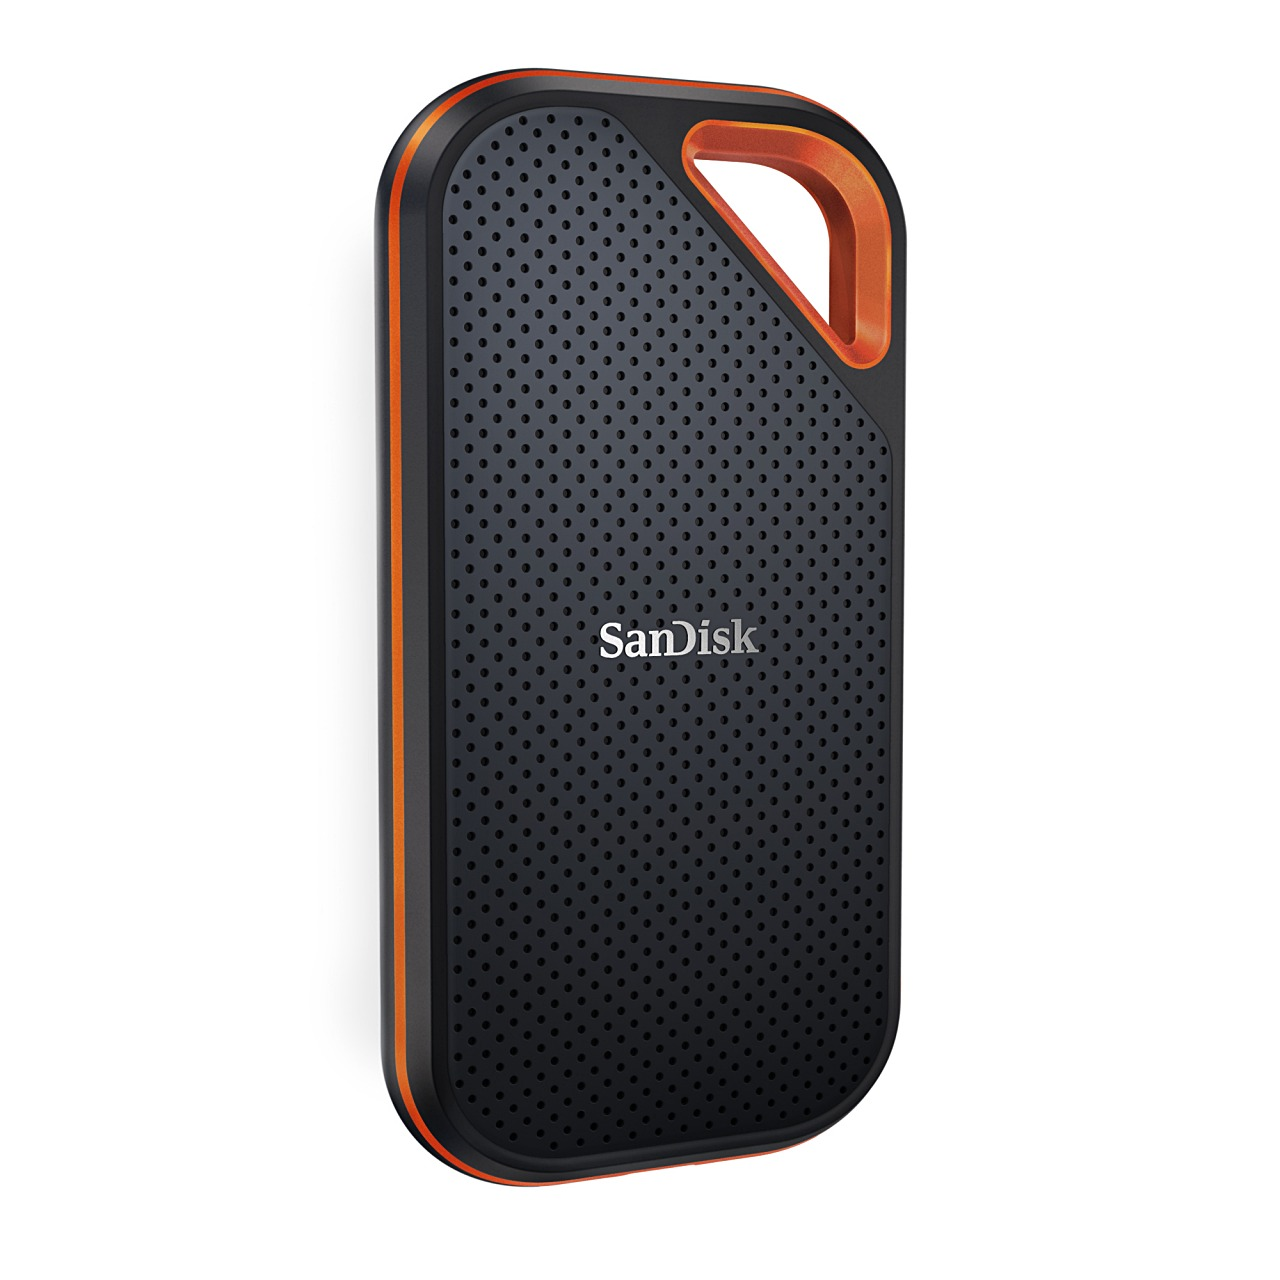 WD 推出為攝影愛好者設計的 SanDisk Extreme PRO 行動固態硬碟